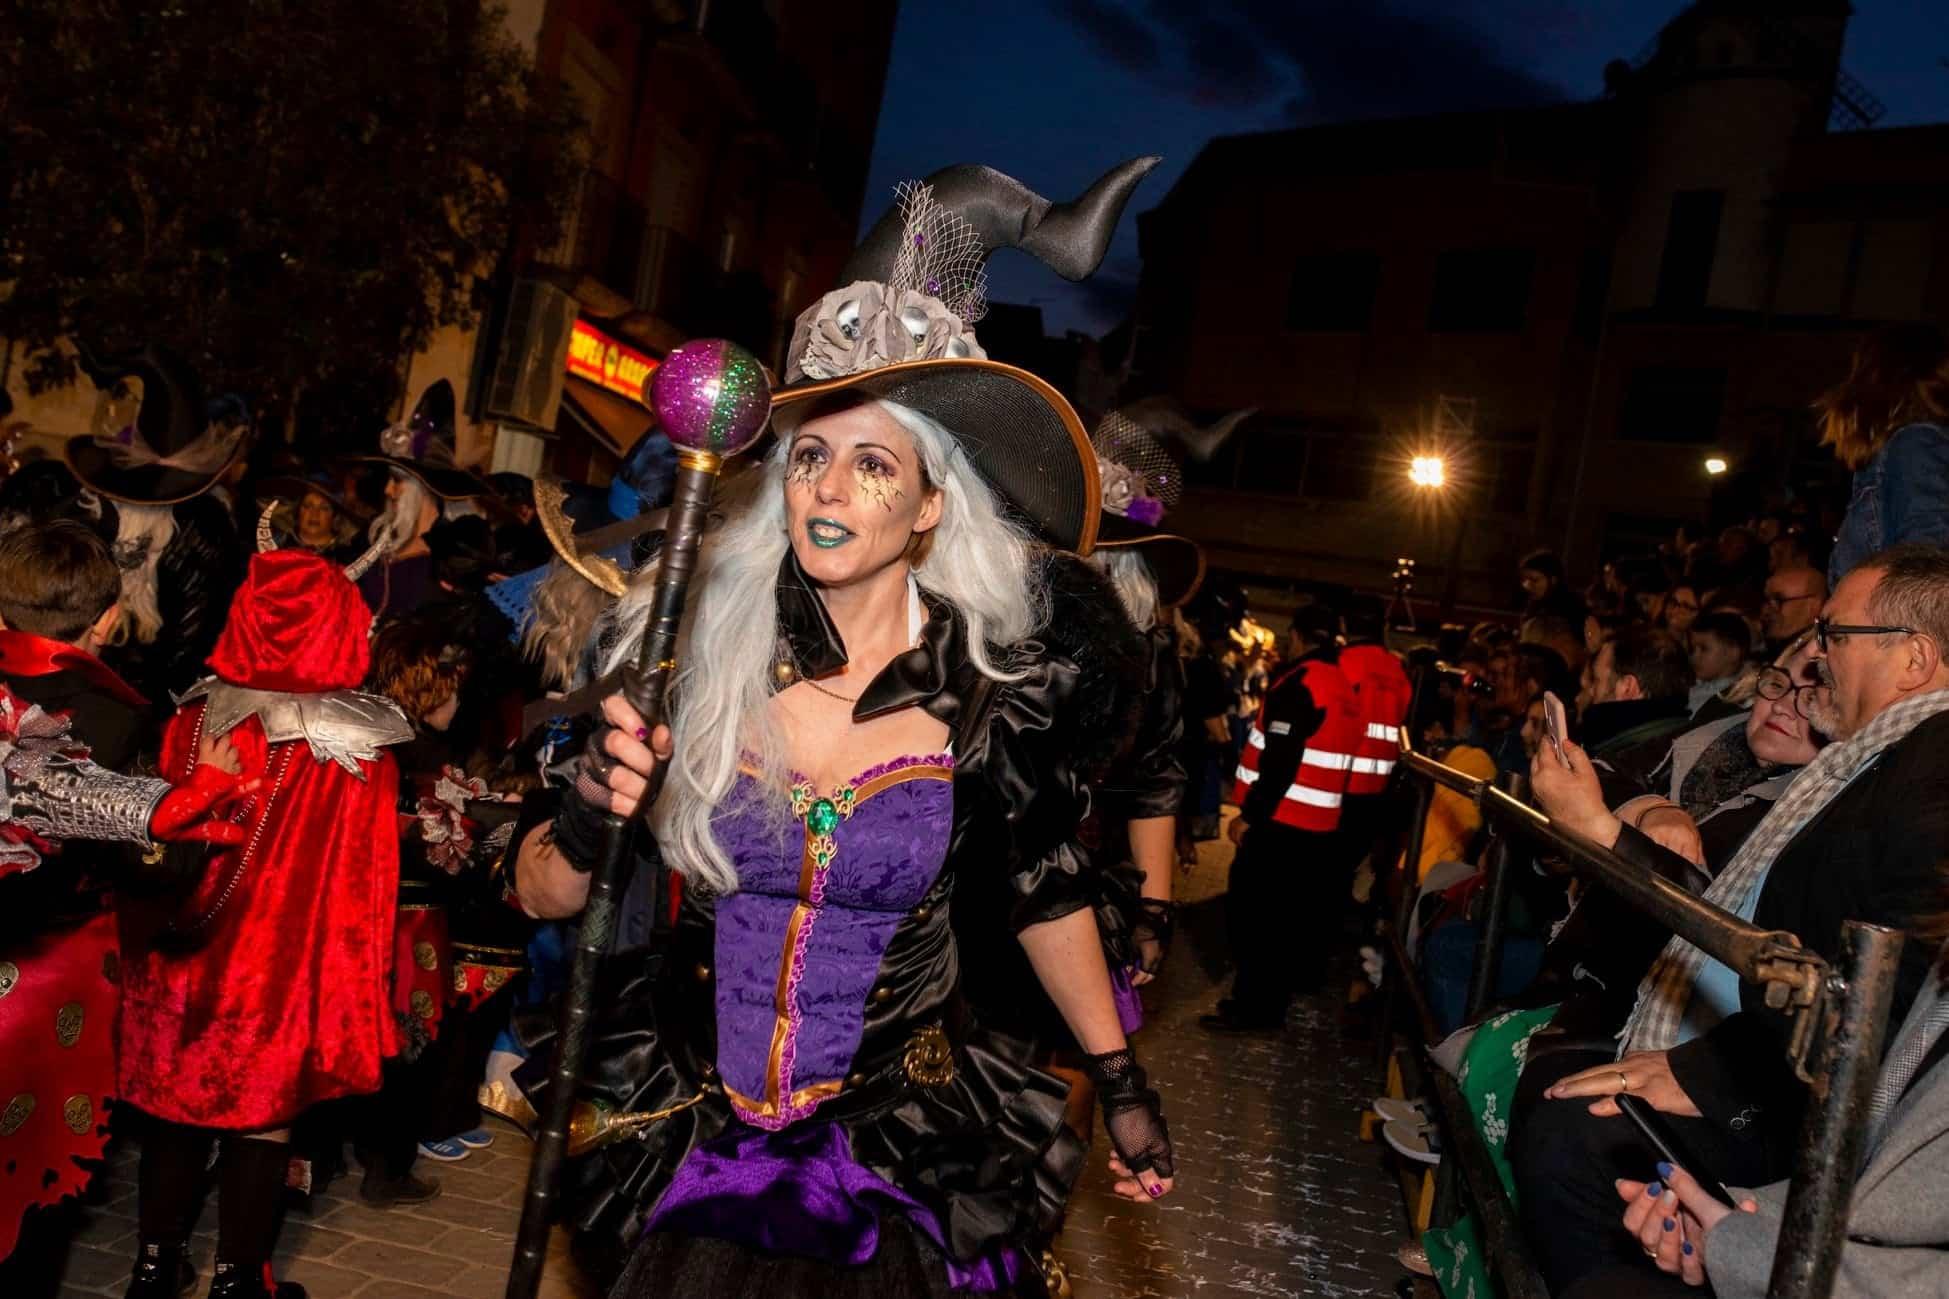 Carnaval de herencia 2020 ofertorio 164 - Selección de fotografías del Ofertorio del Carnaval de Herencia